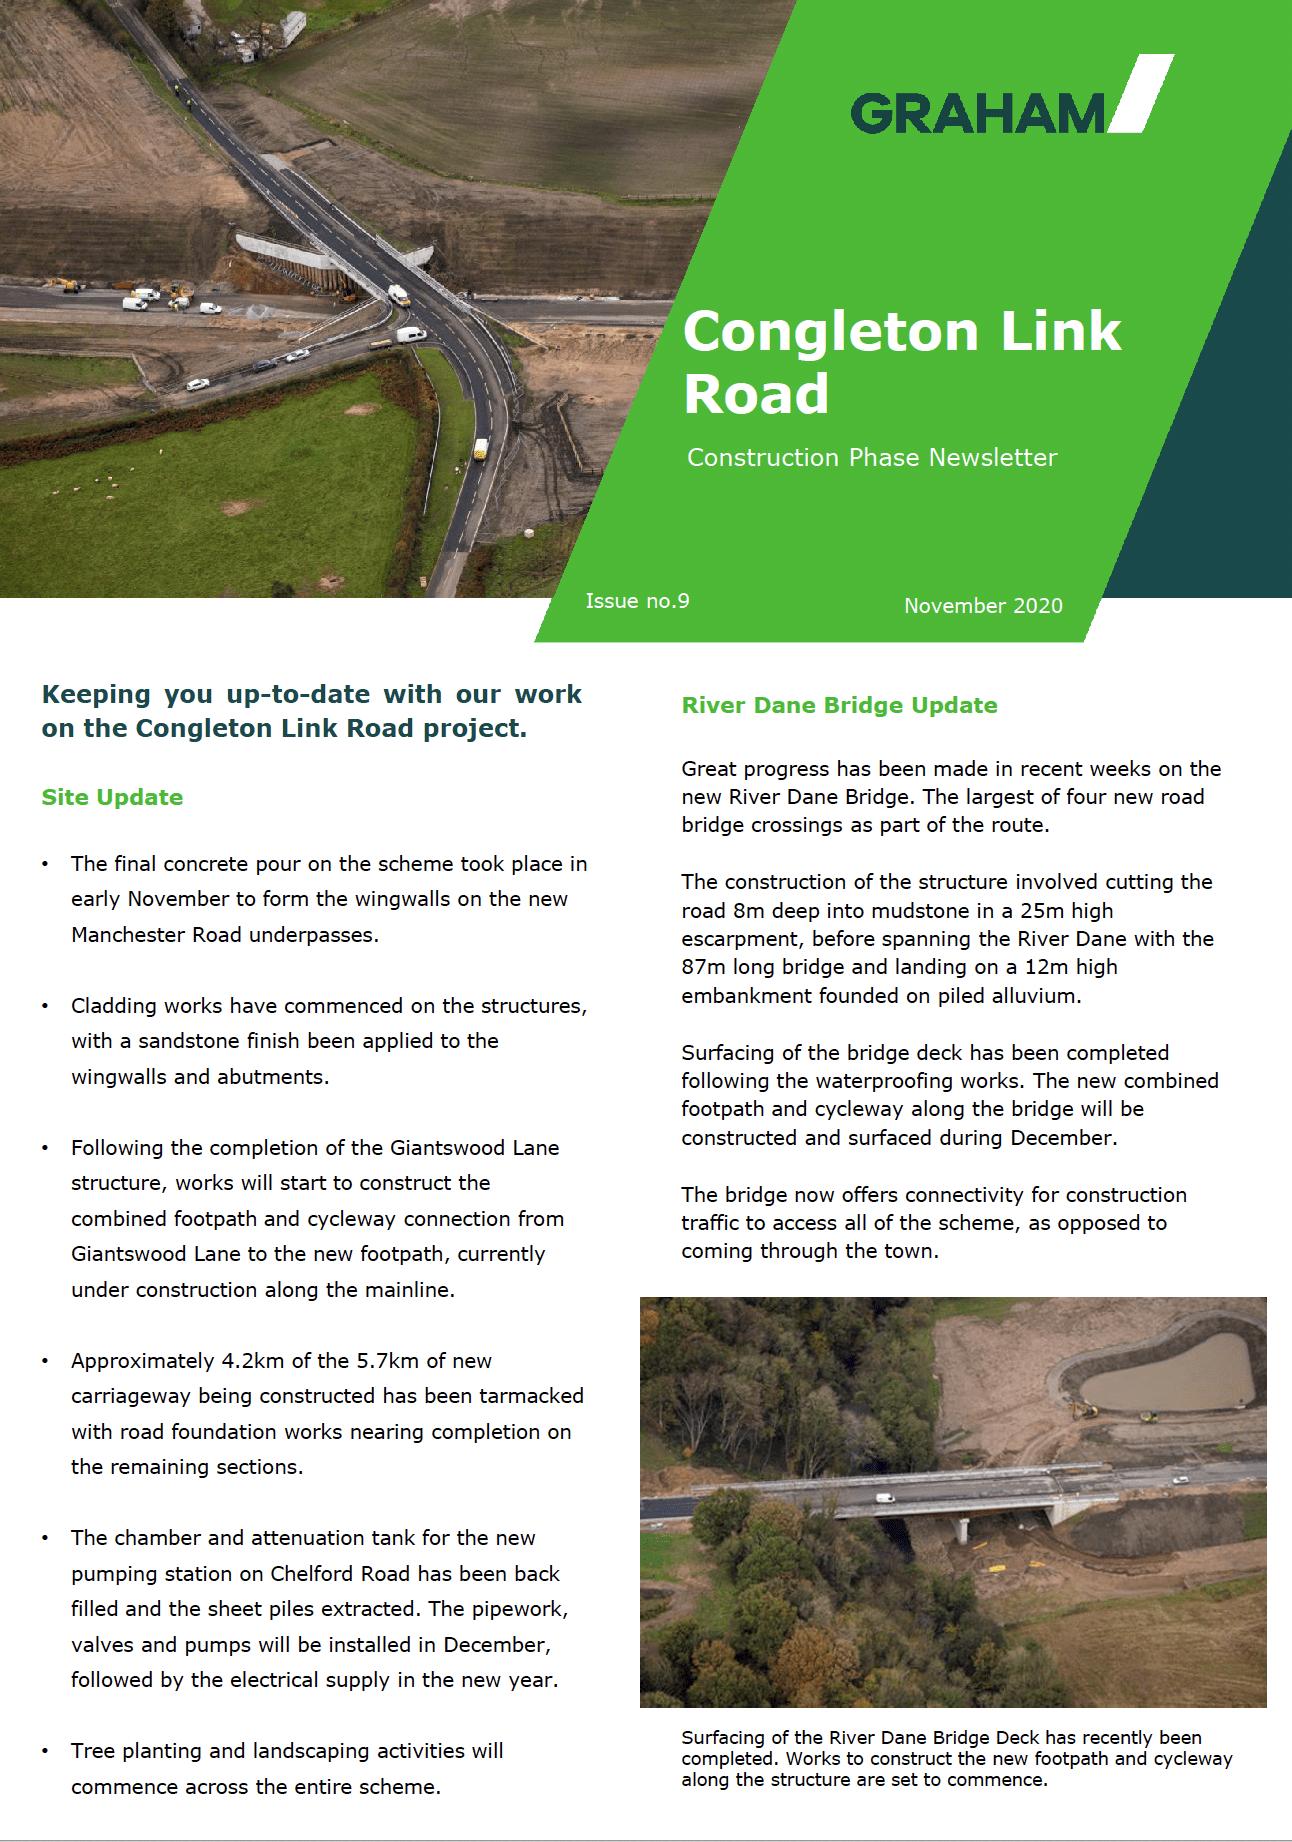 Congleton Link Road